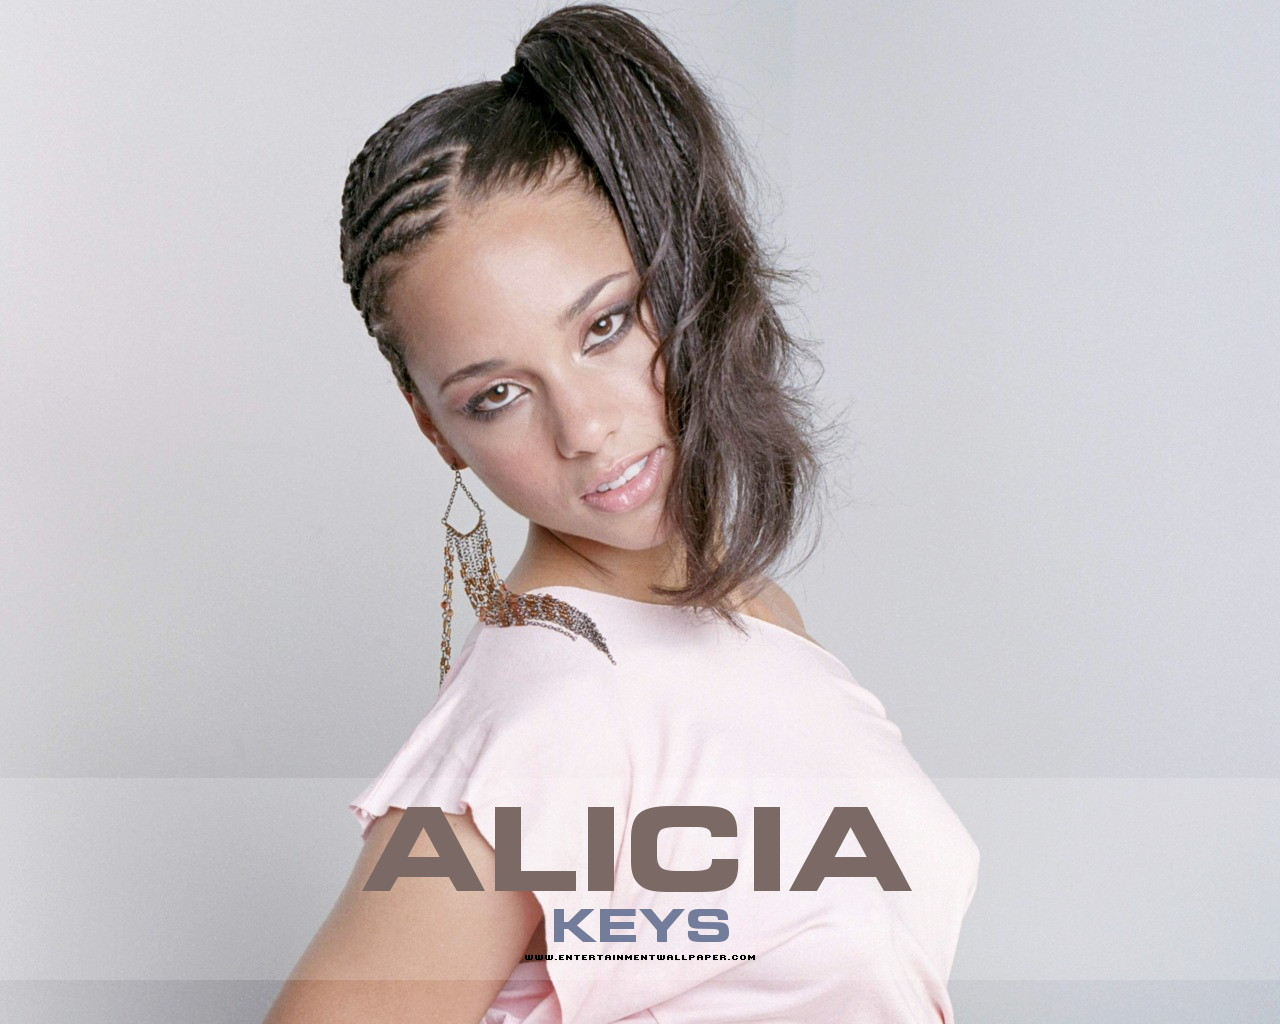 http://4.bp.blogspot.com/-H2jb8eNT92o/TnlwBOXbFWI/AAAAAAAAPn0/-QmUnDYDpCI/s1600/Alicia-Keys-HQ_00.jpg